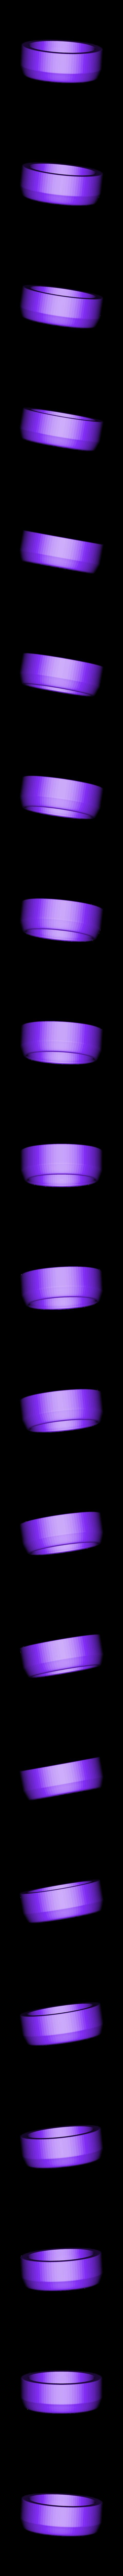 Lucio_hoseMntC.stl Download free STL file Overwatch Lucio Blaster • 3D printer object, Adafruit